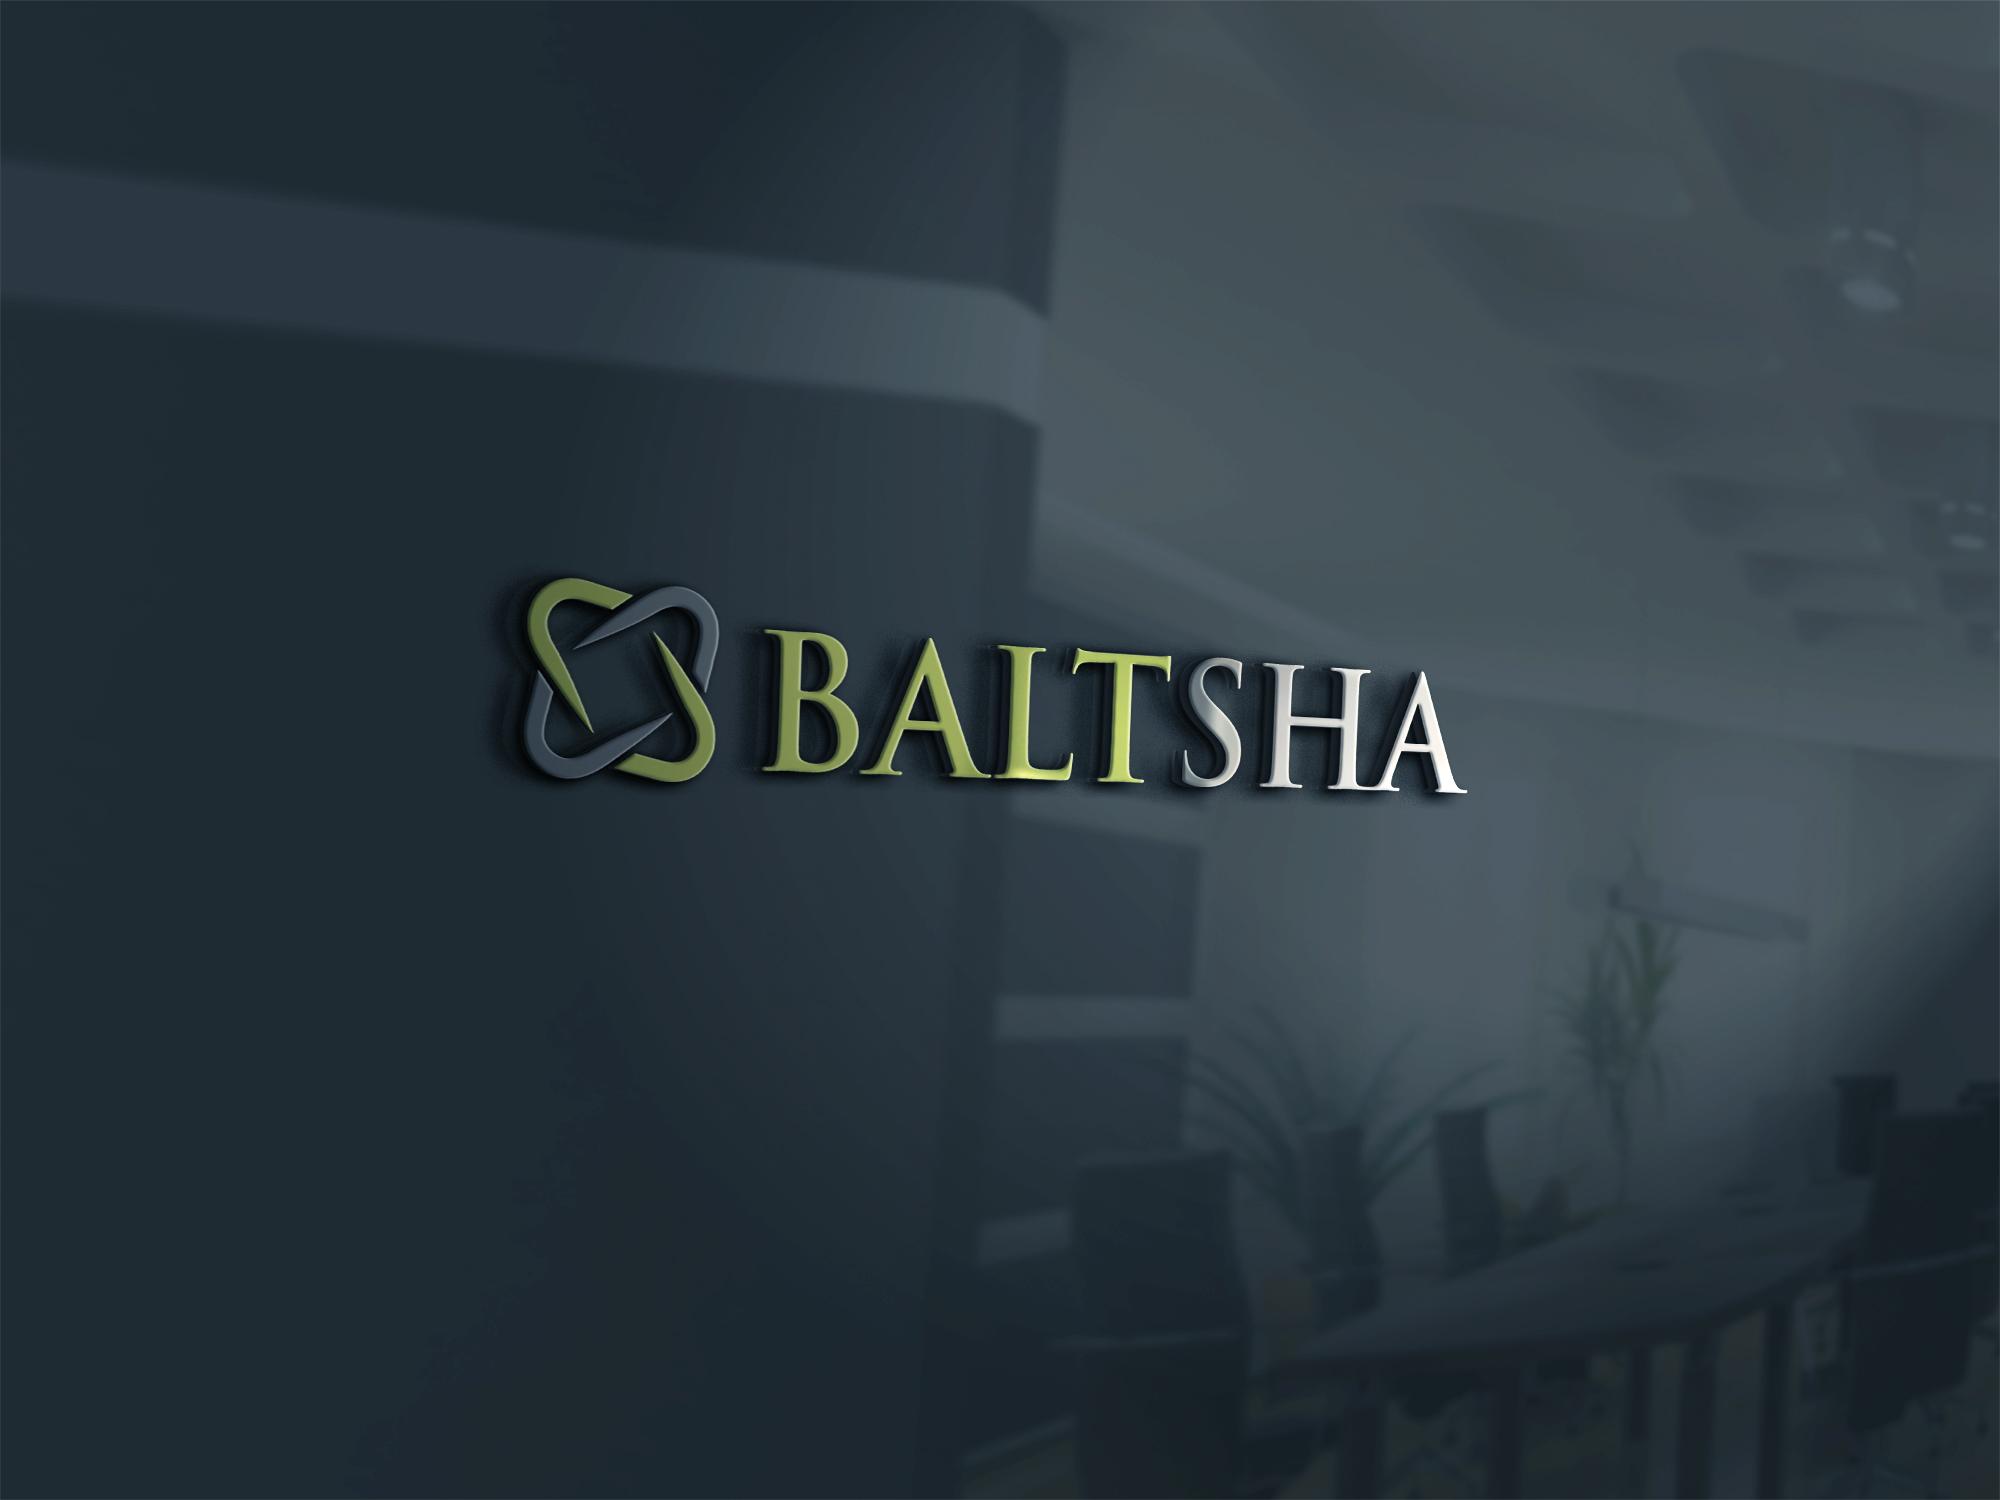 BALTSHAH-mok.jpg